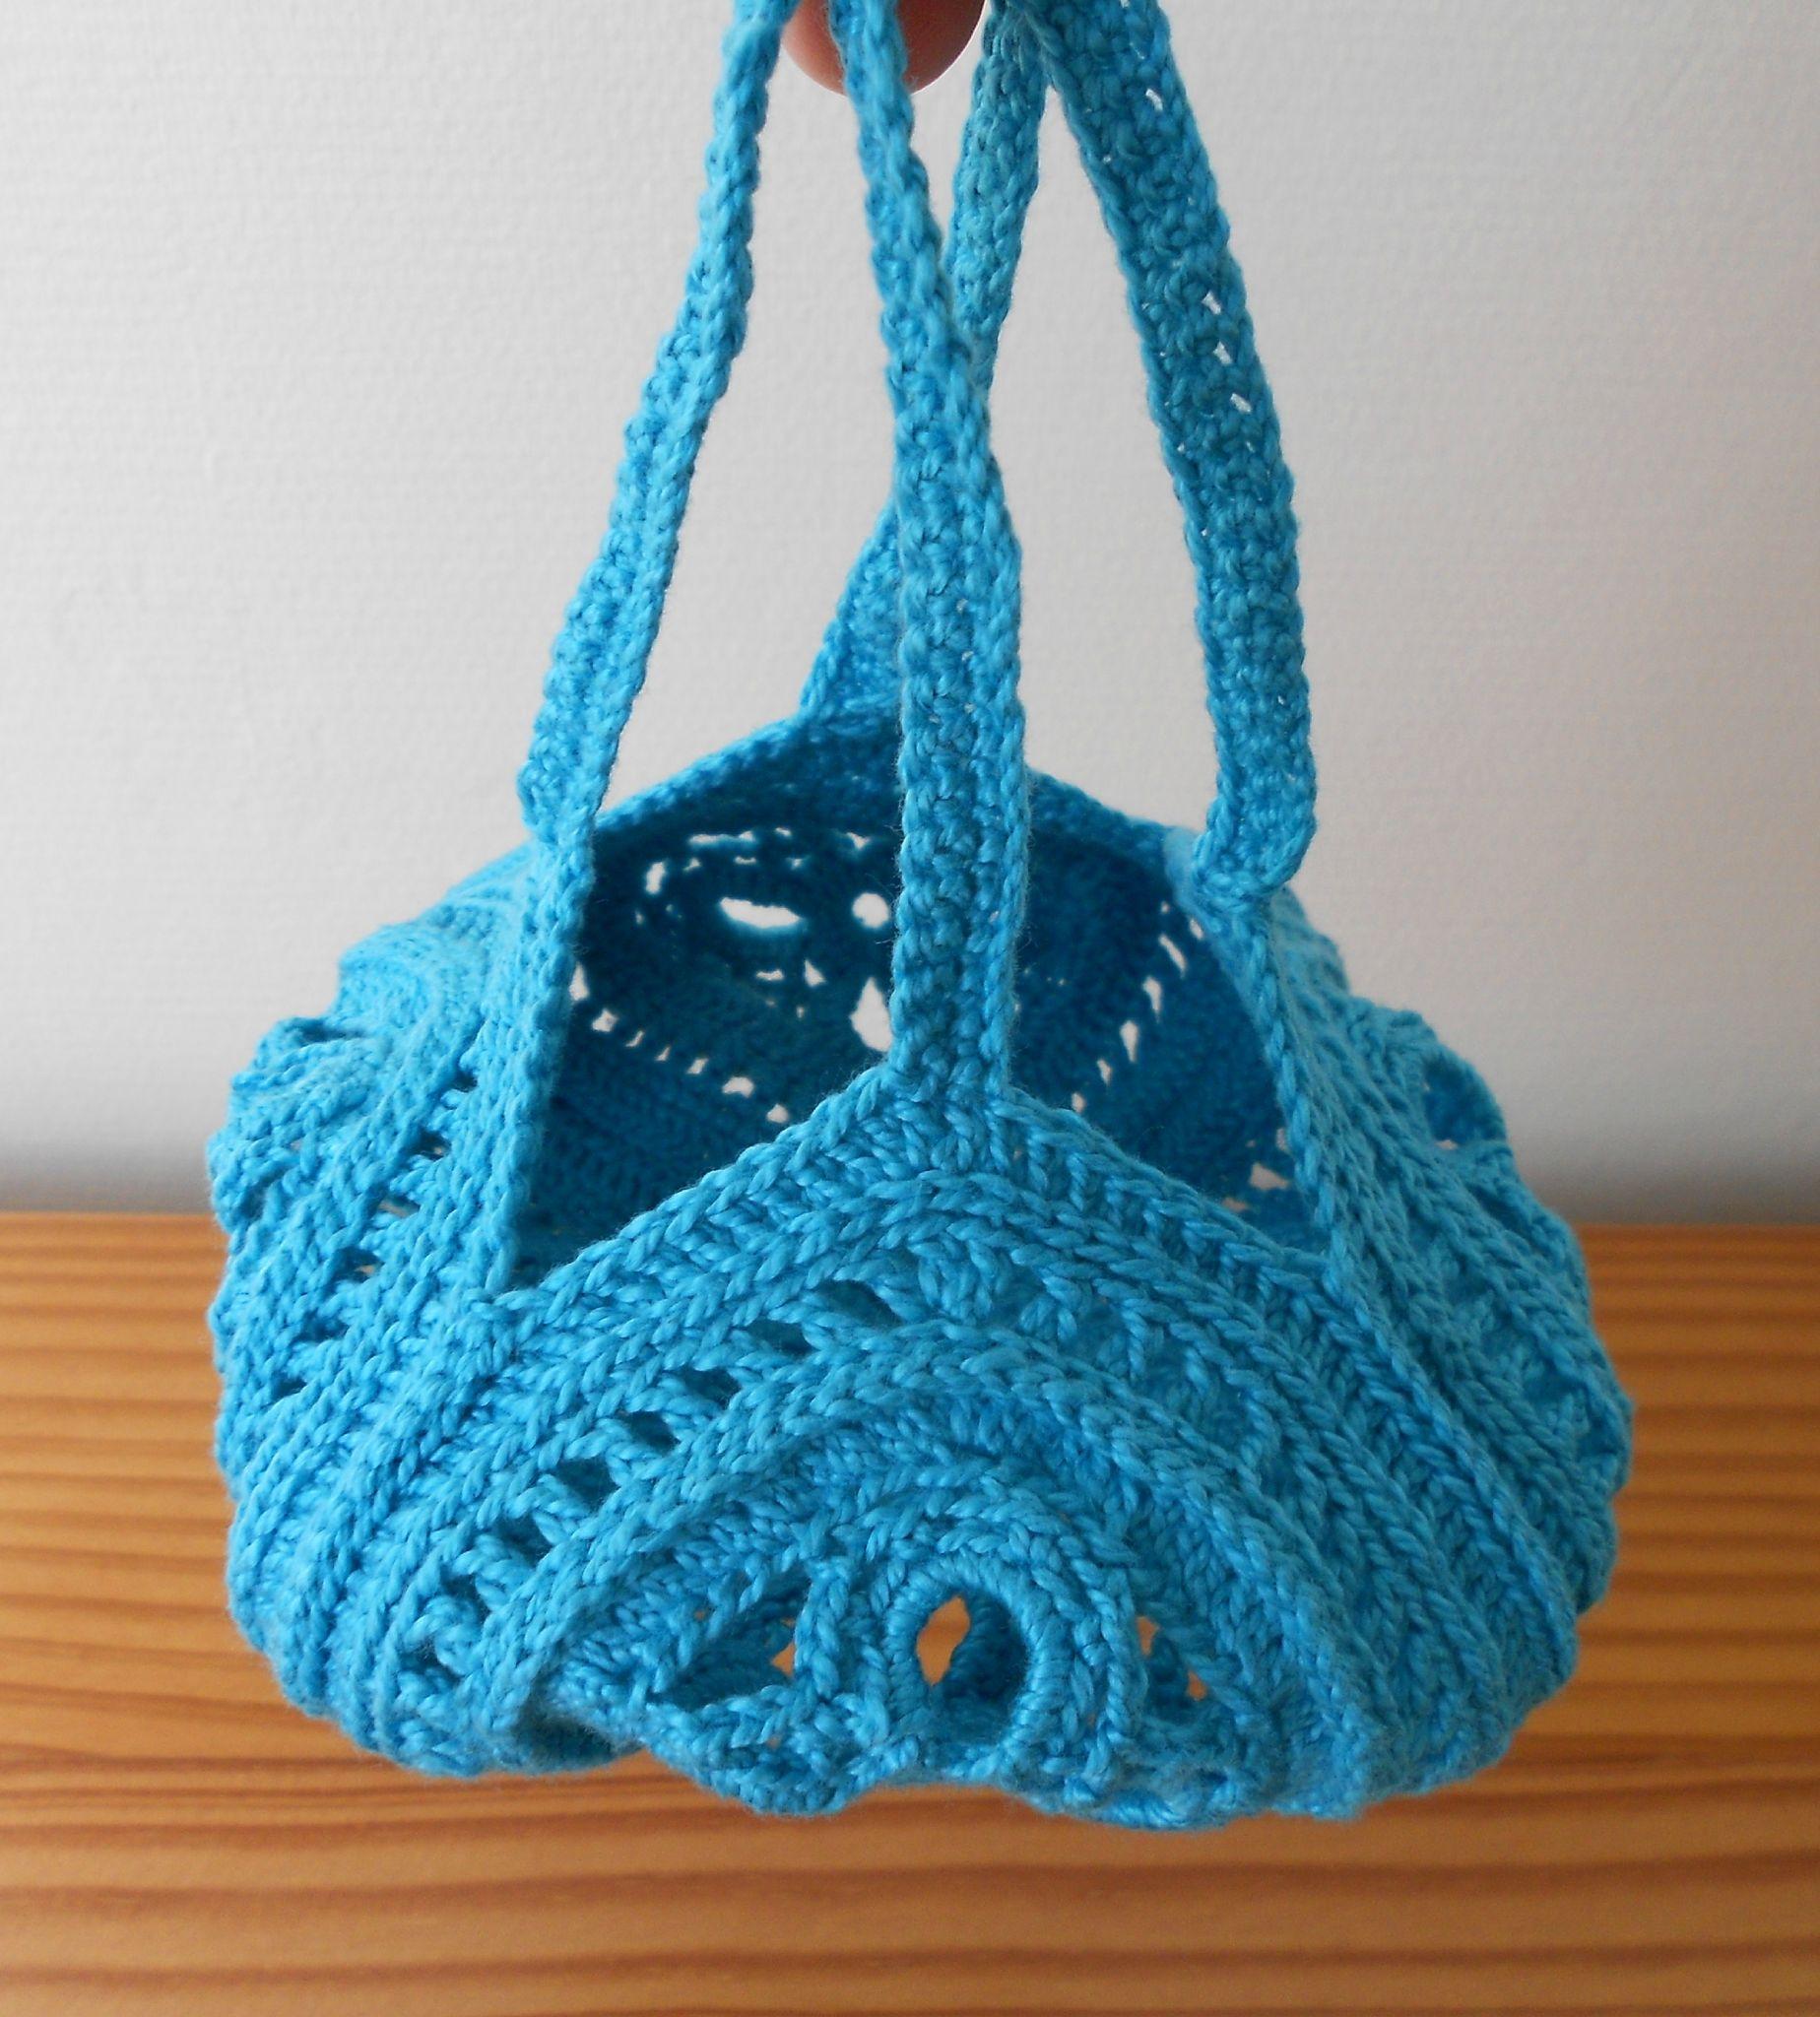 Des Sacs En Crochet : Petit sac au crochet thalicreations